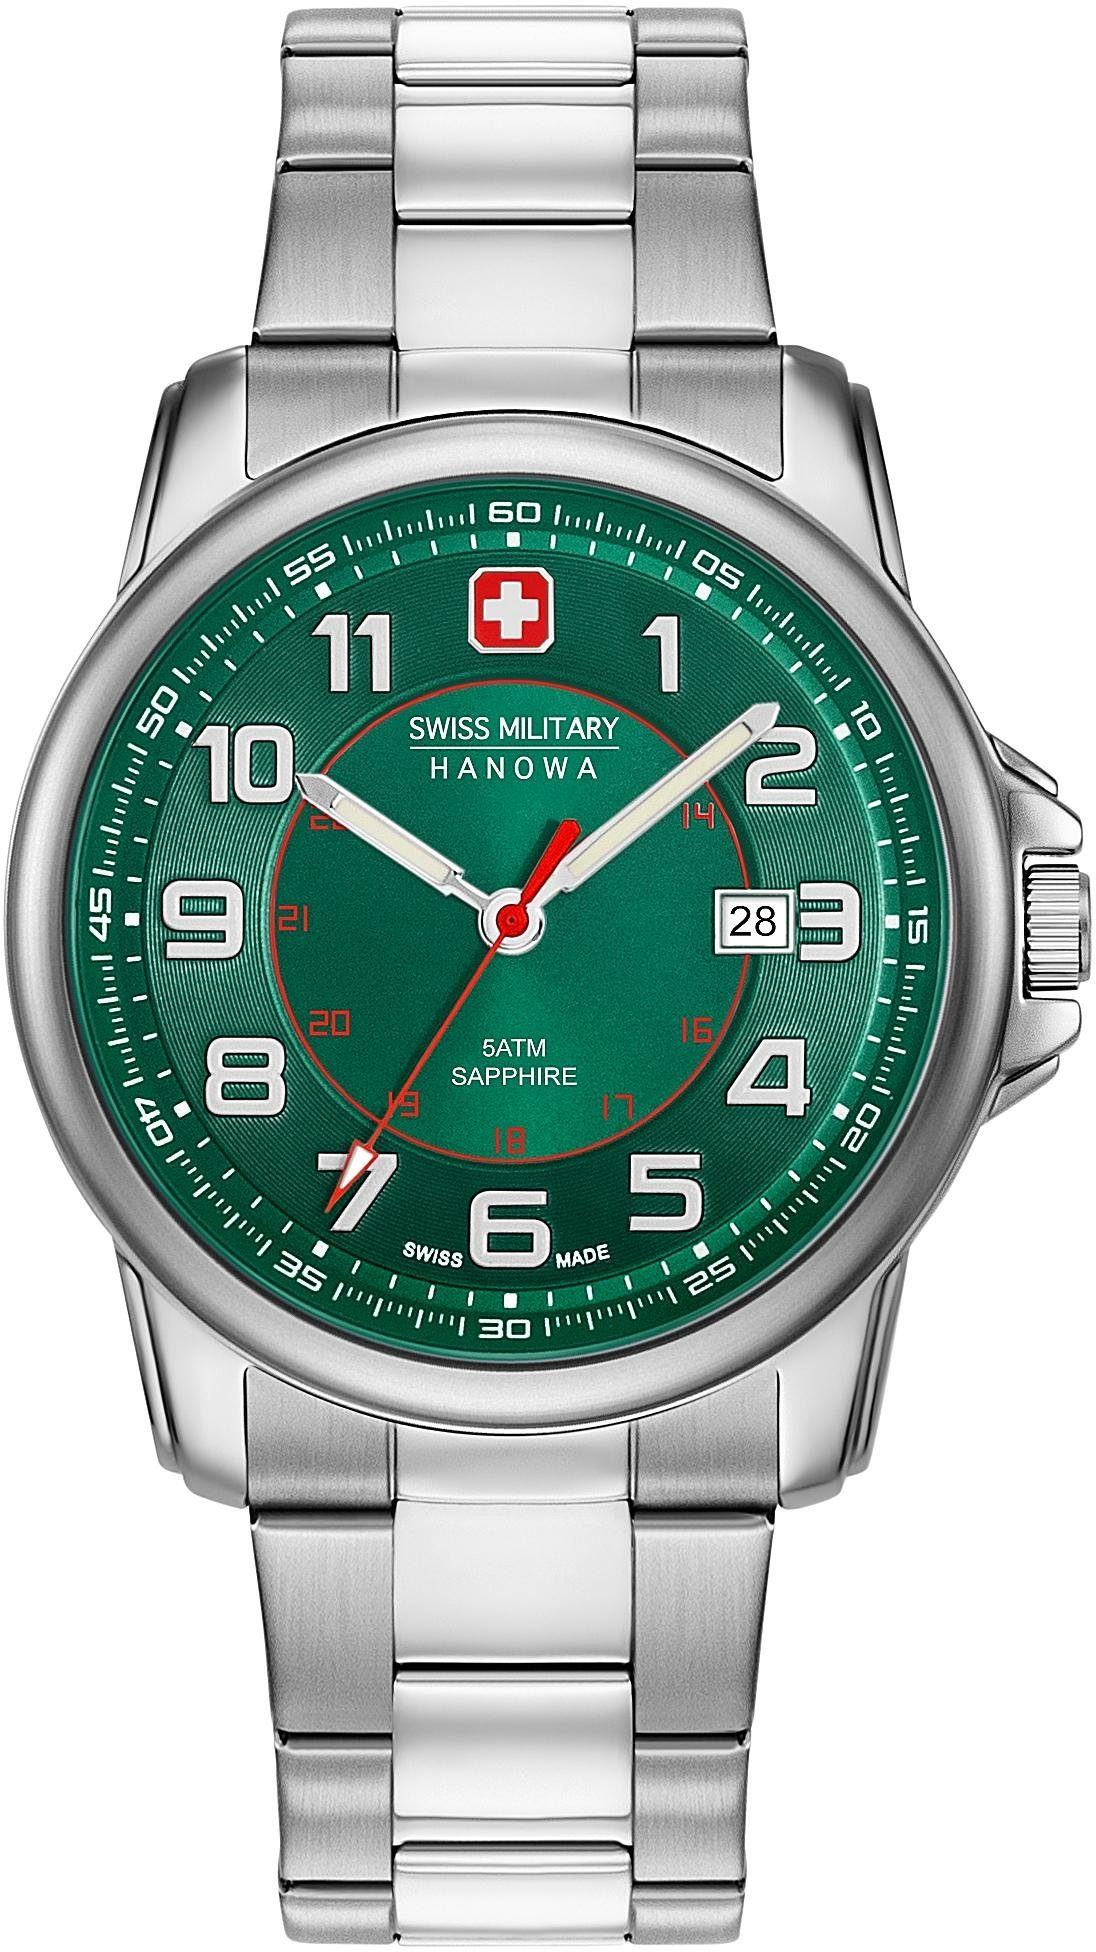 Swiss Military Hanowa Schweizer Uhr SWISS GRENADIER, 06-5330.04.006 | Uhren > Schweizer Uhren | Swiss Military Hanowa